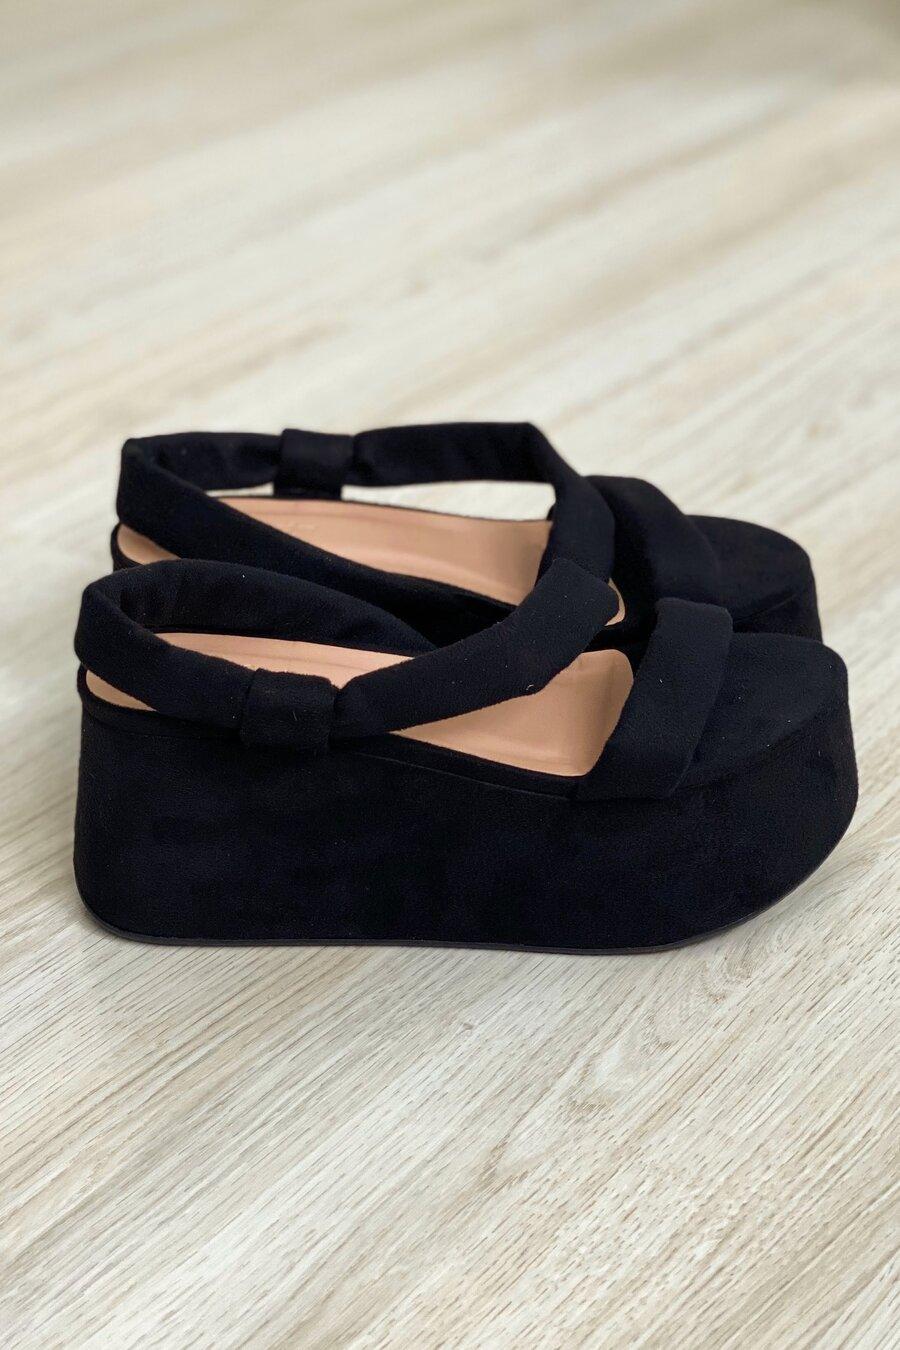 Flatform Anelise Black